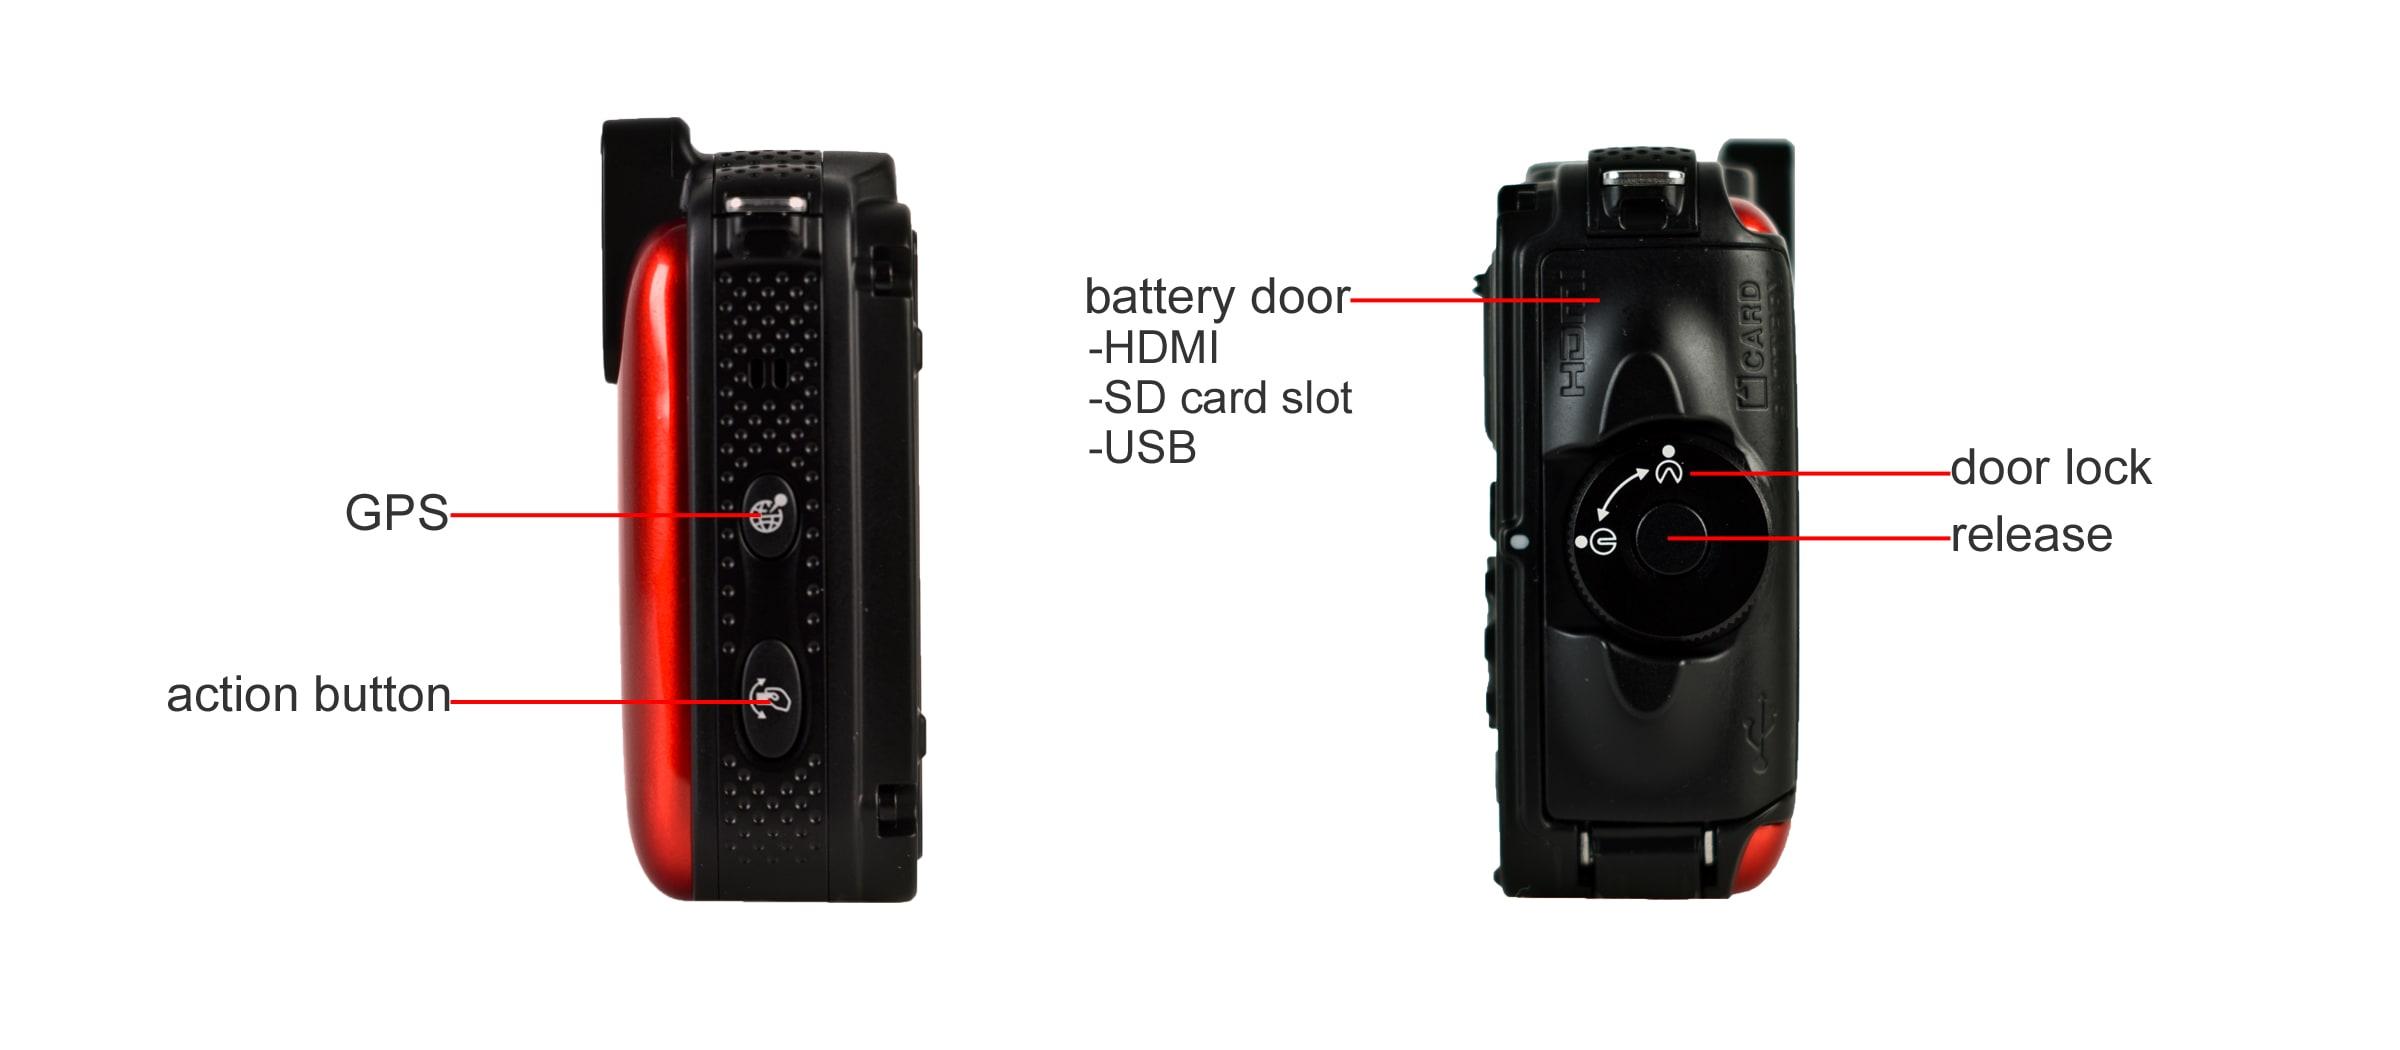 A breakdown of the Nikon AW120's sides.